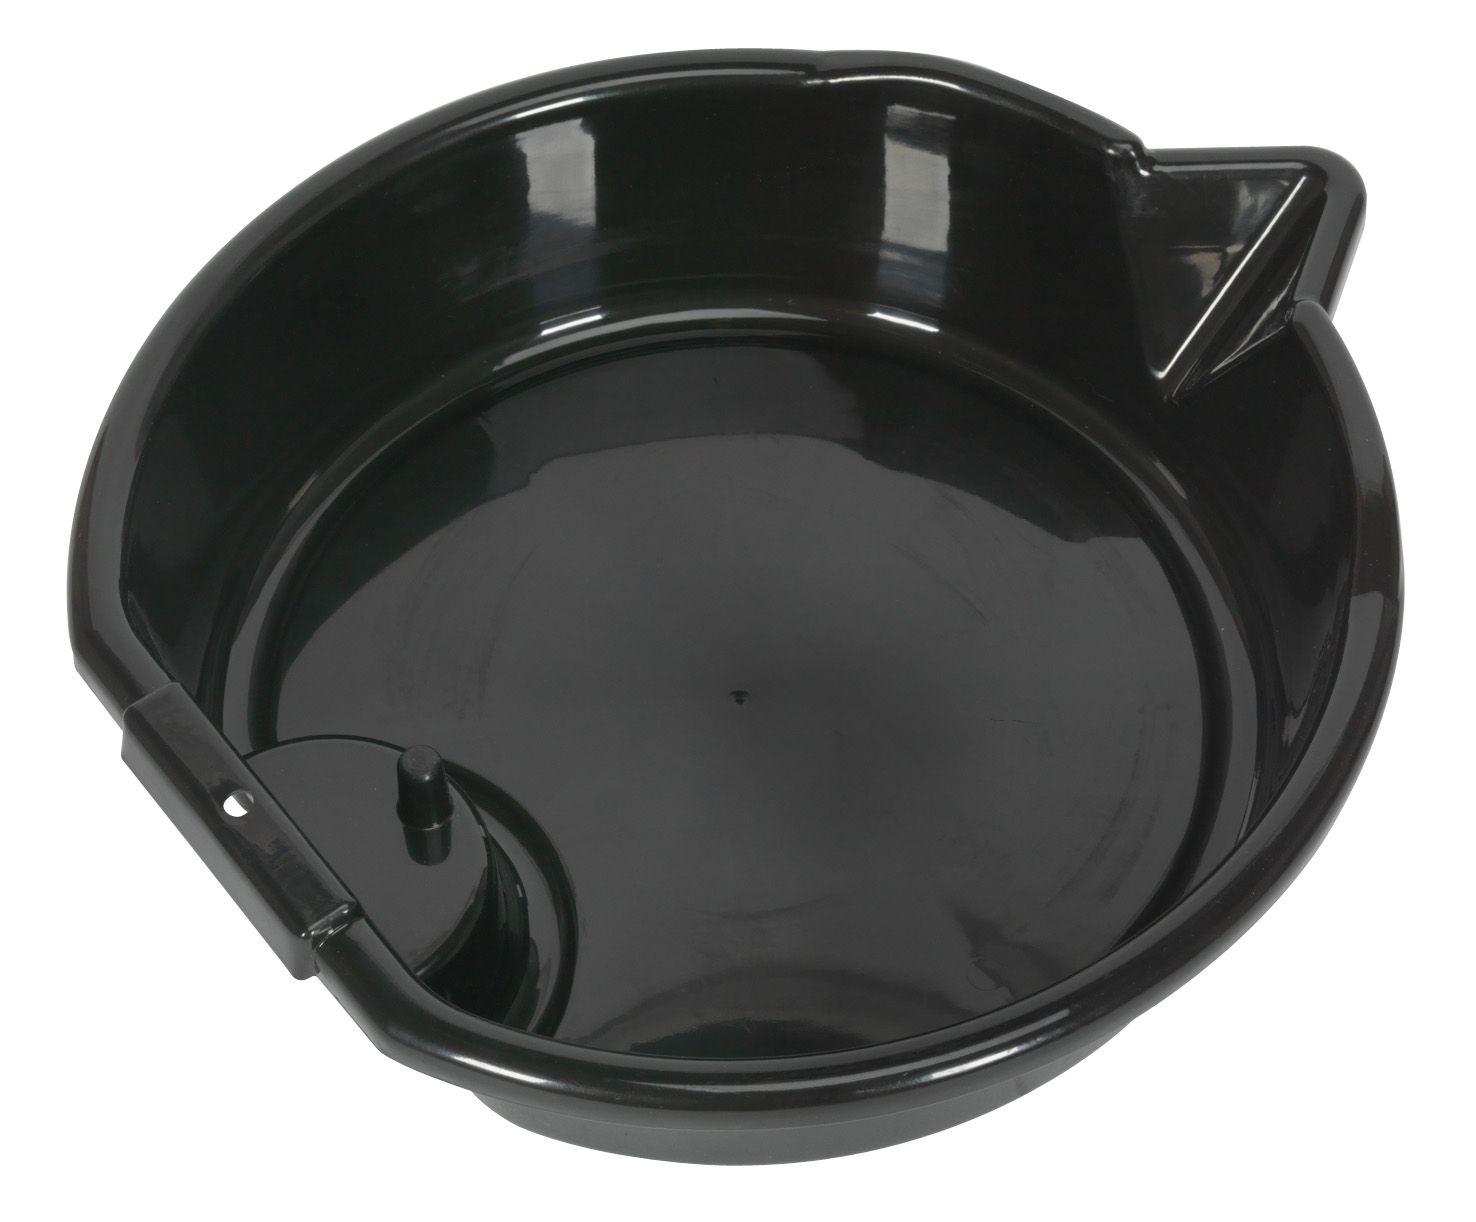 Sealey Oil/Fluid Drain Pan 8L